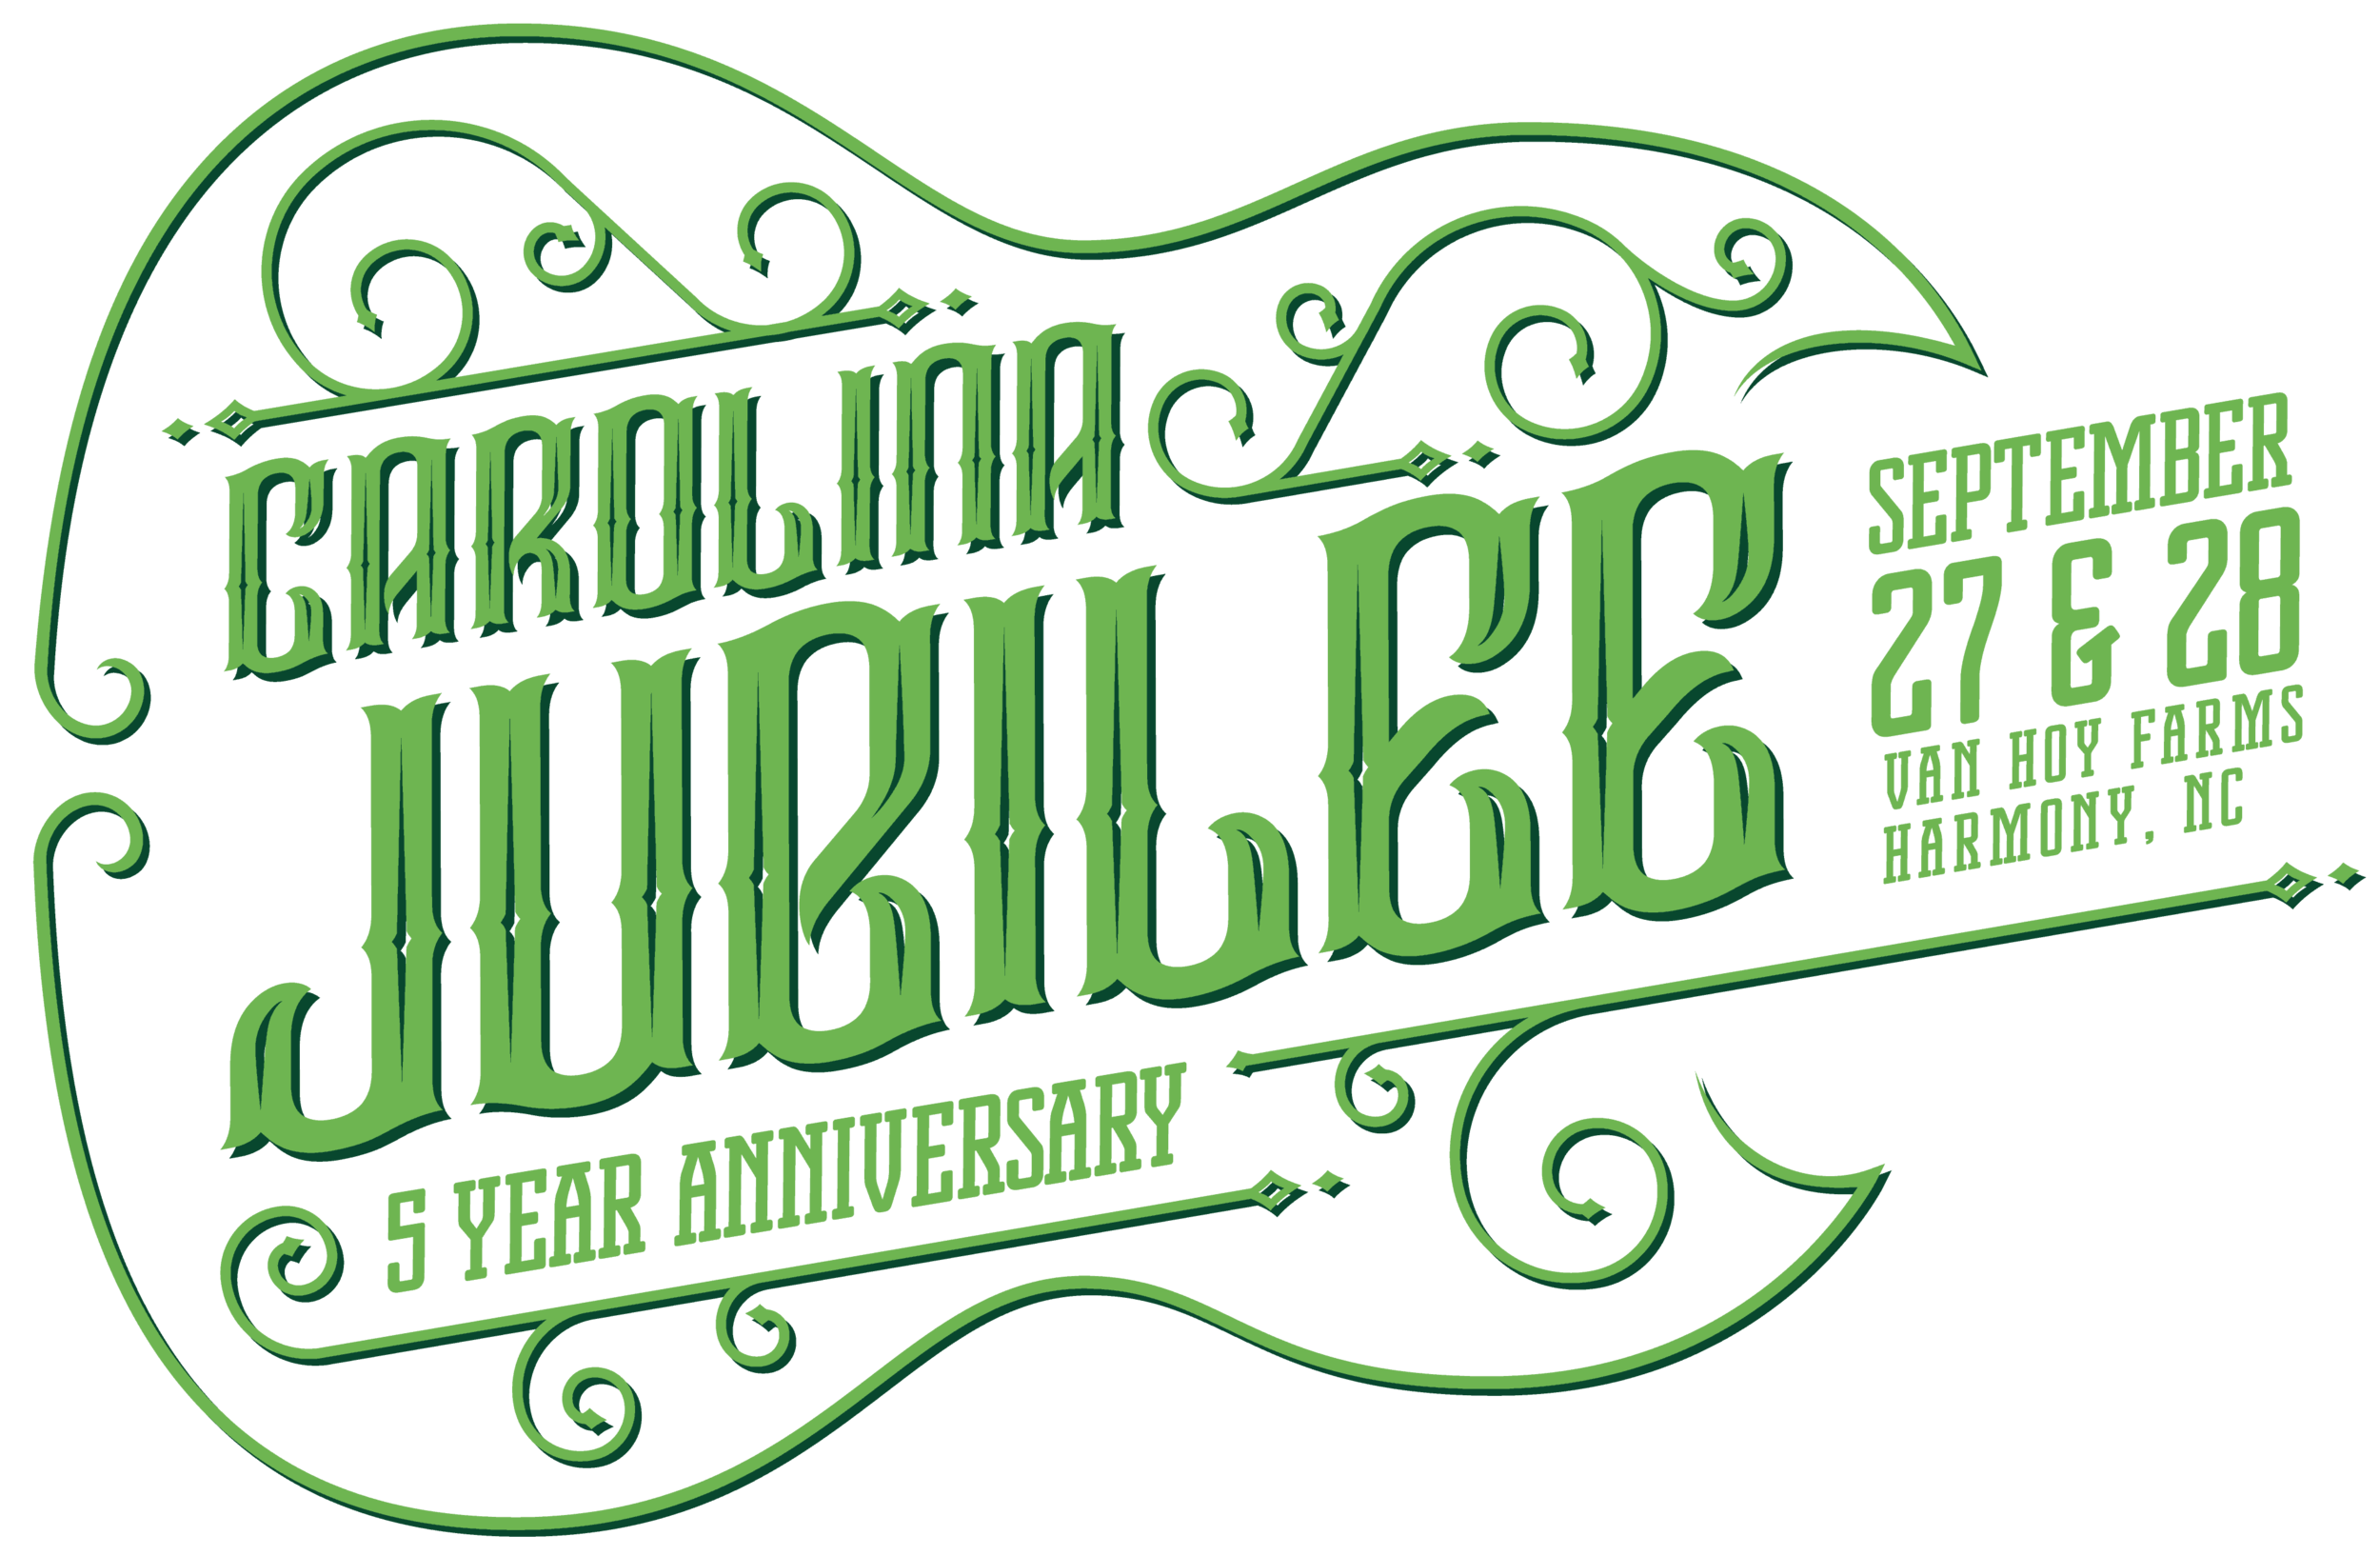 Carolina-Jubliee-2019-logo.png